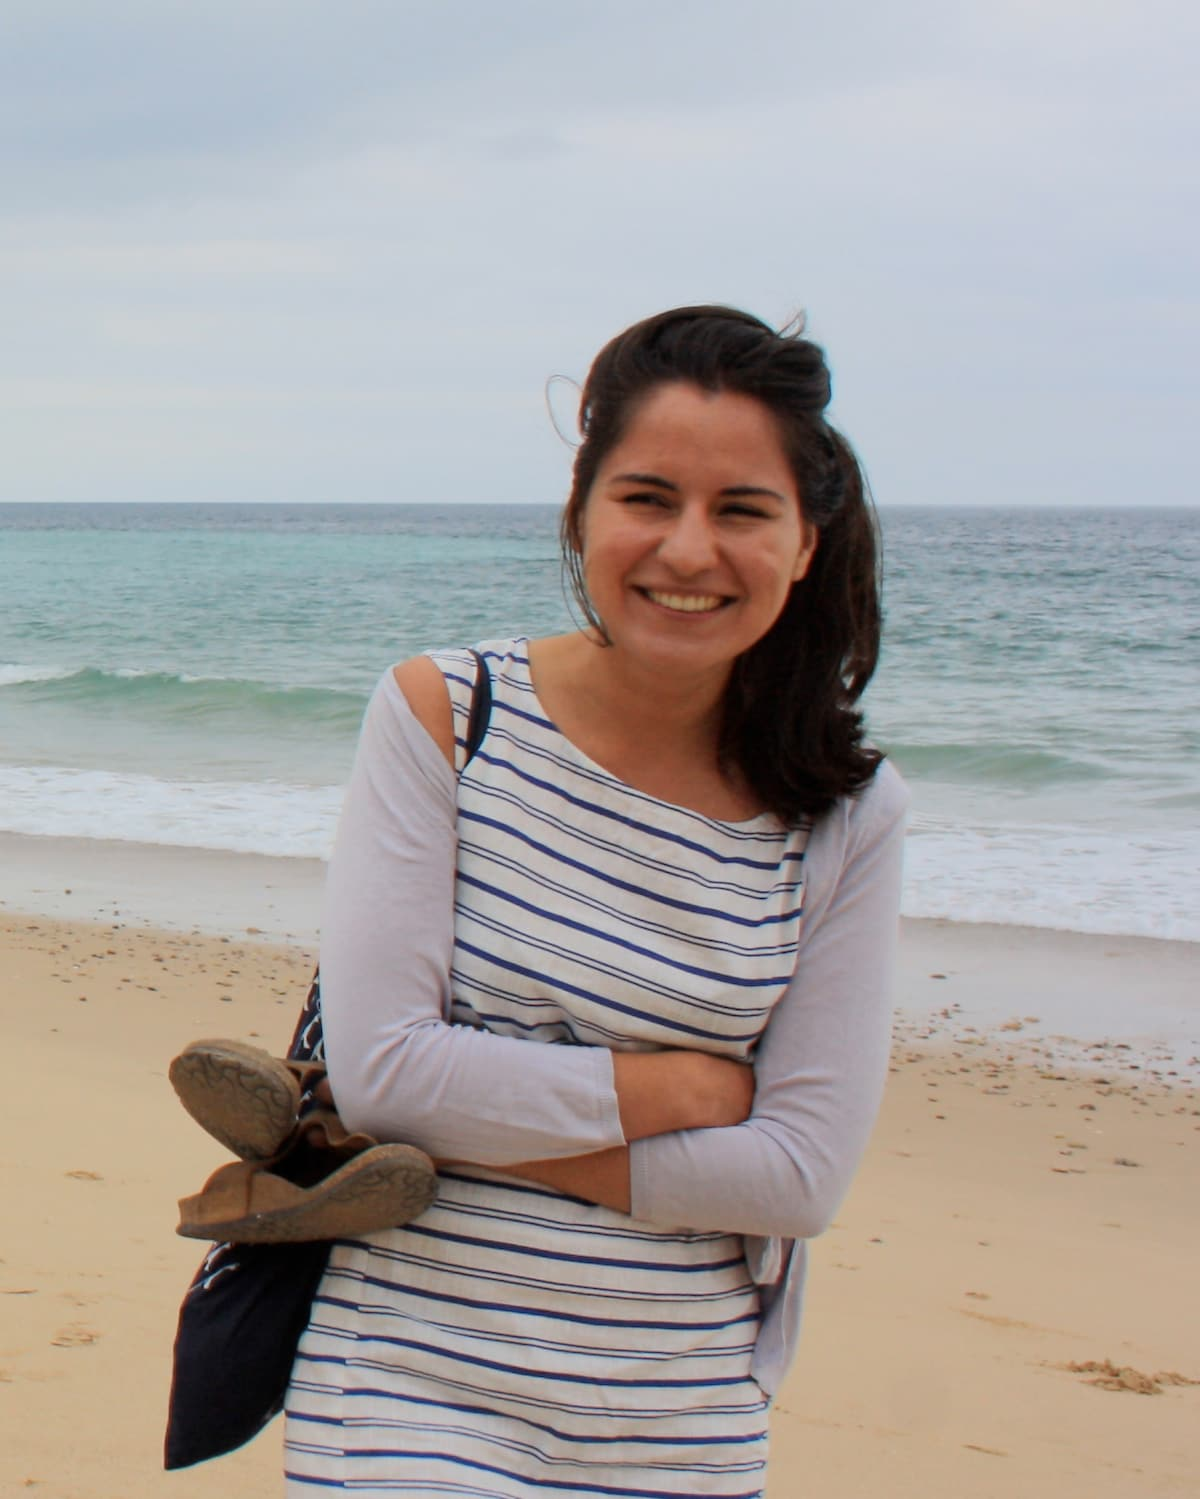 Julia from Cuernavaca